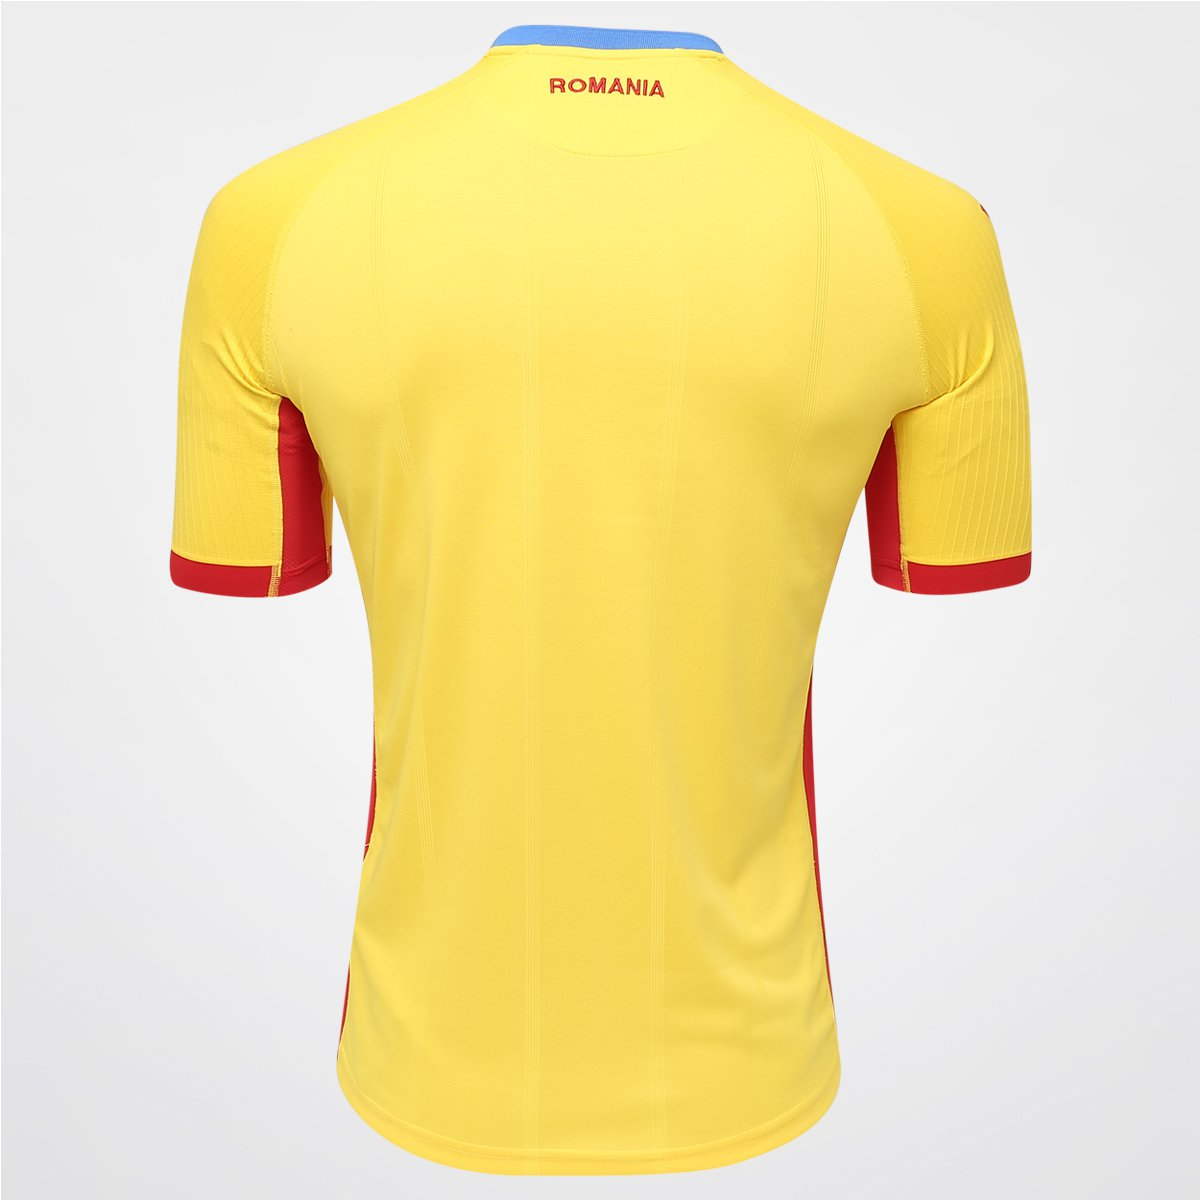 Camisa Romênia Home 15 16 s nº Torcedor Joma Masculina - Amarelo ... 3a31b17a8856c